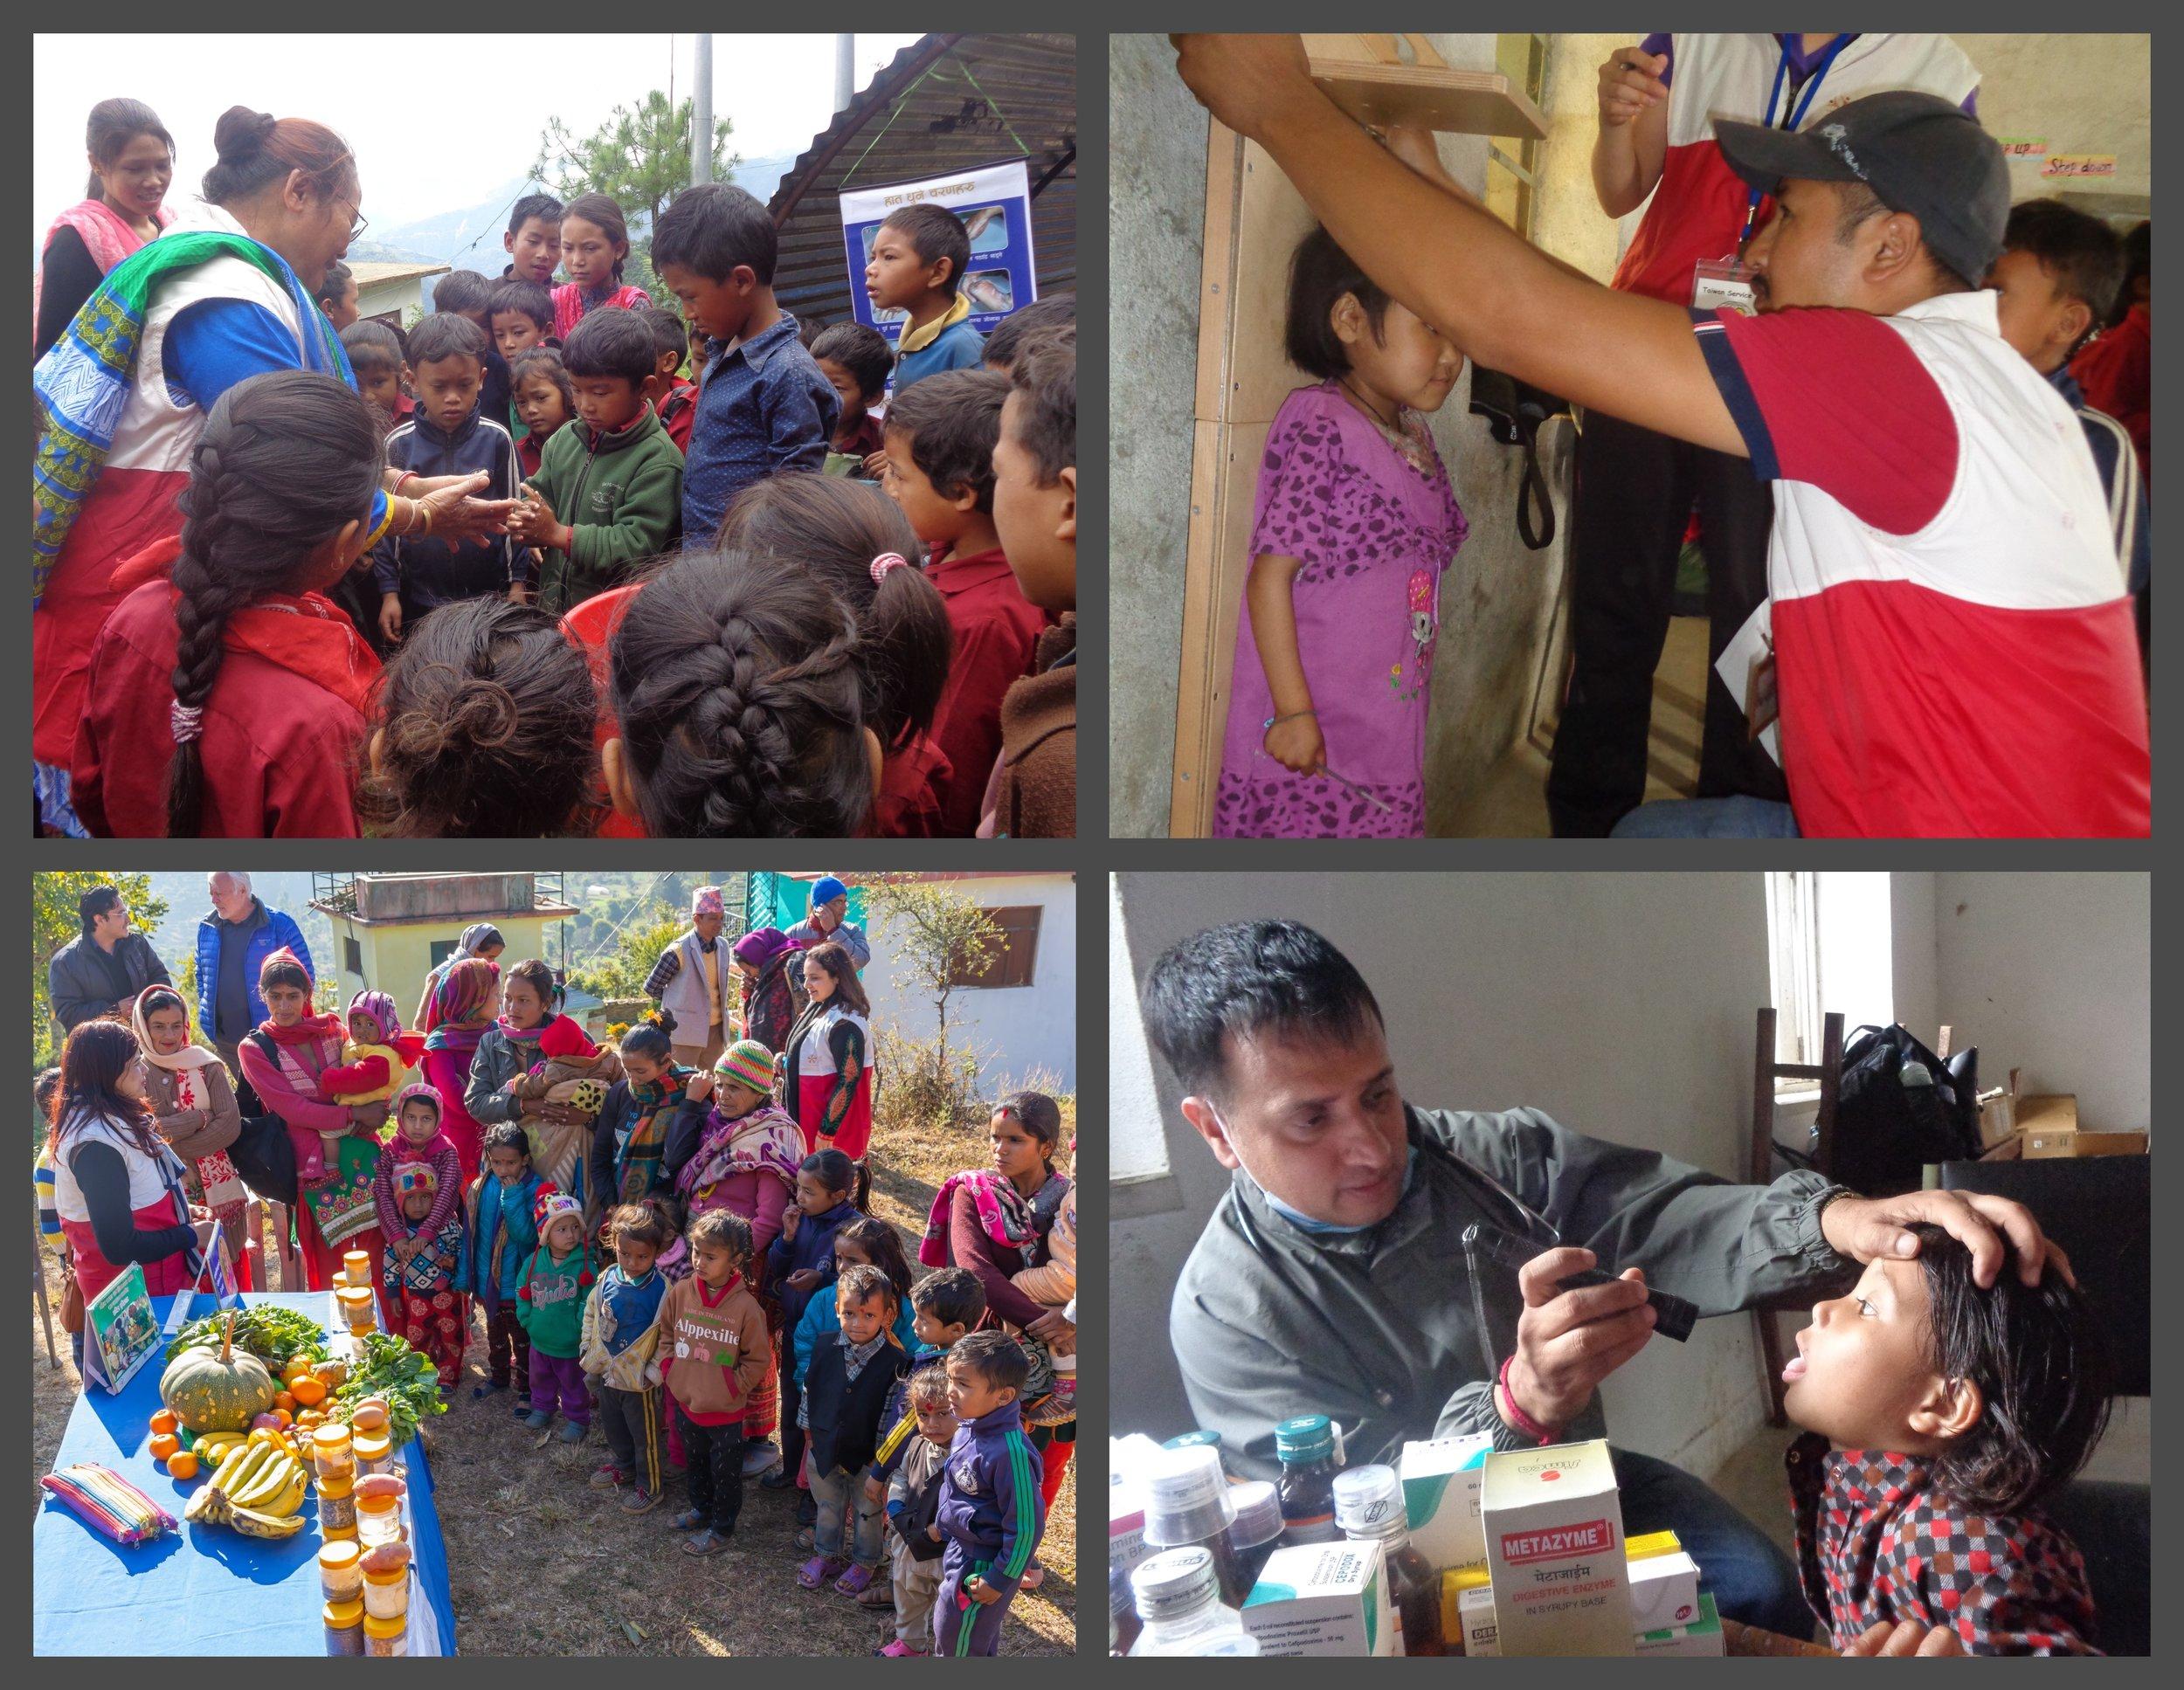 The Sisterhood Nepal Youth Foundation